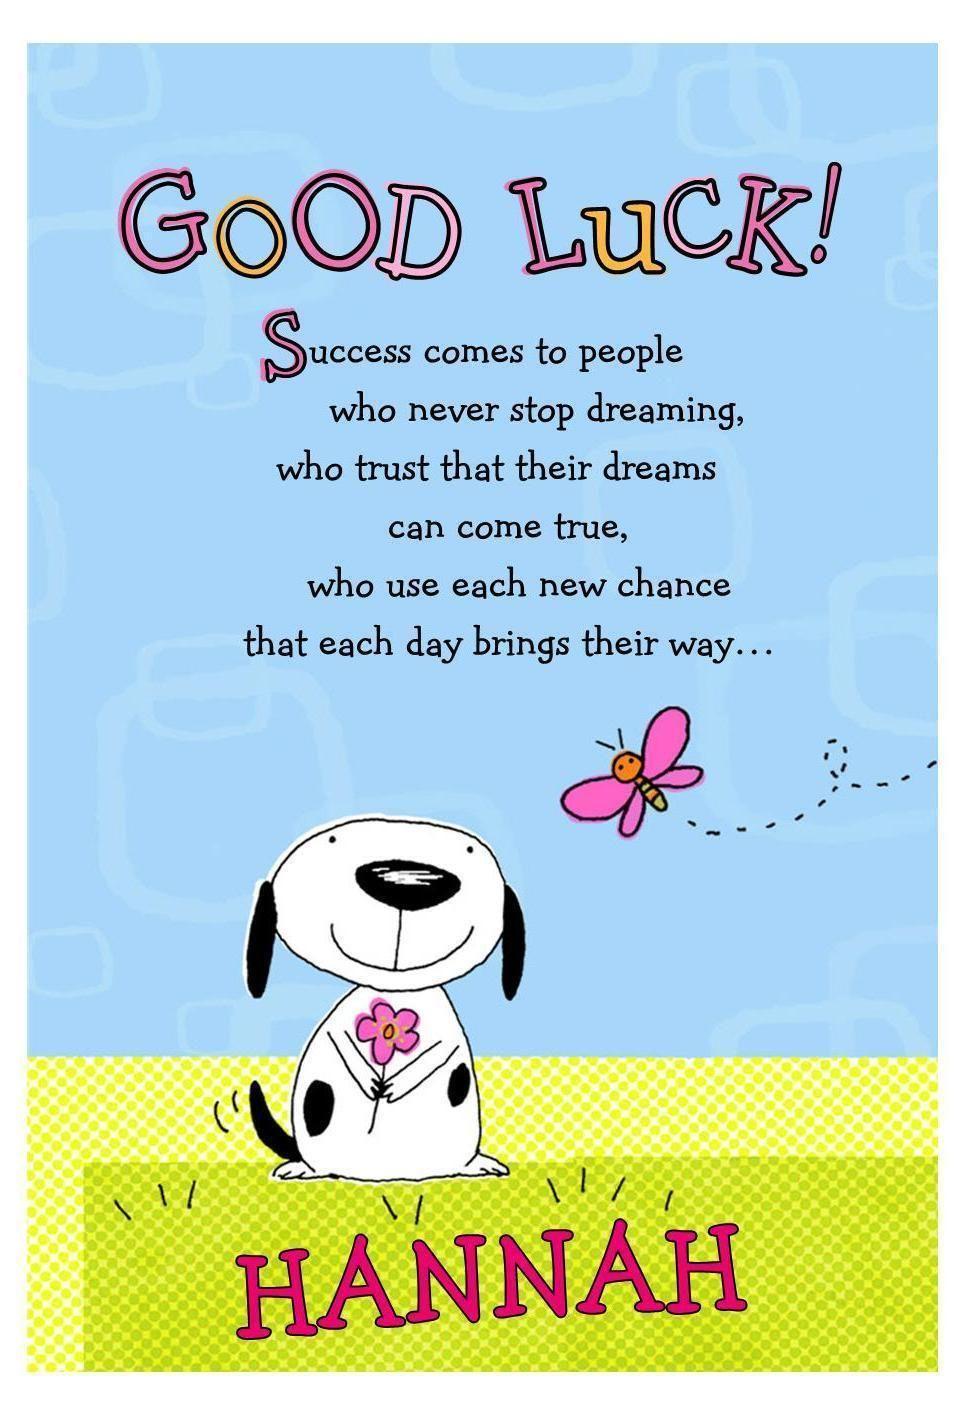 greeting cards ebay home furniture  diy  good luck